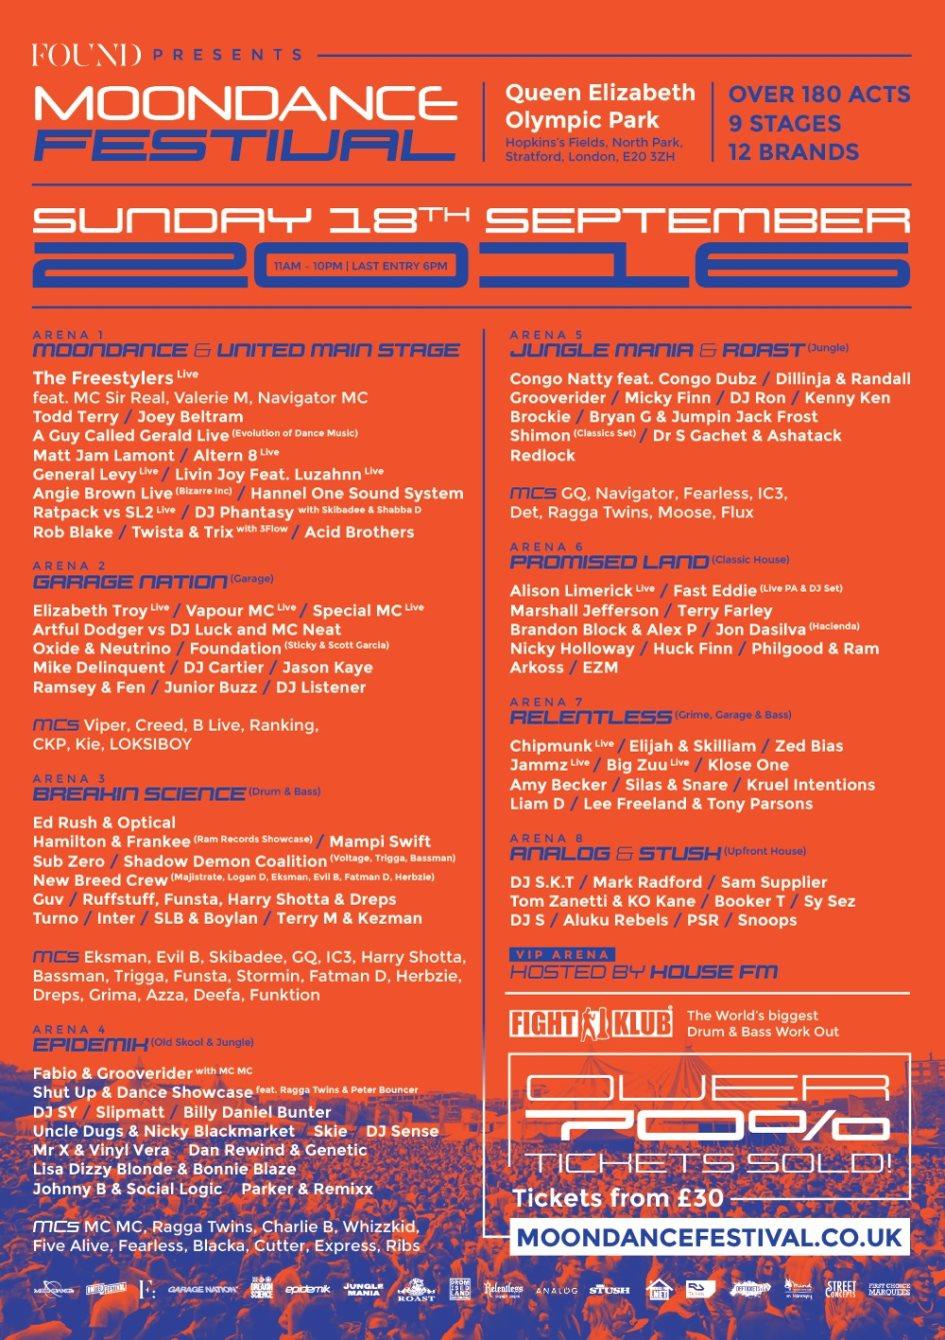 Found presents Moondance Festival 2016 - Flyer front